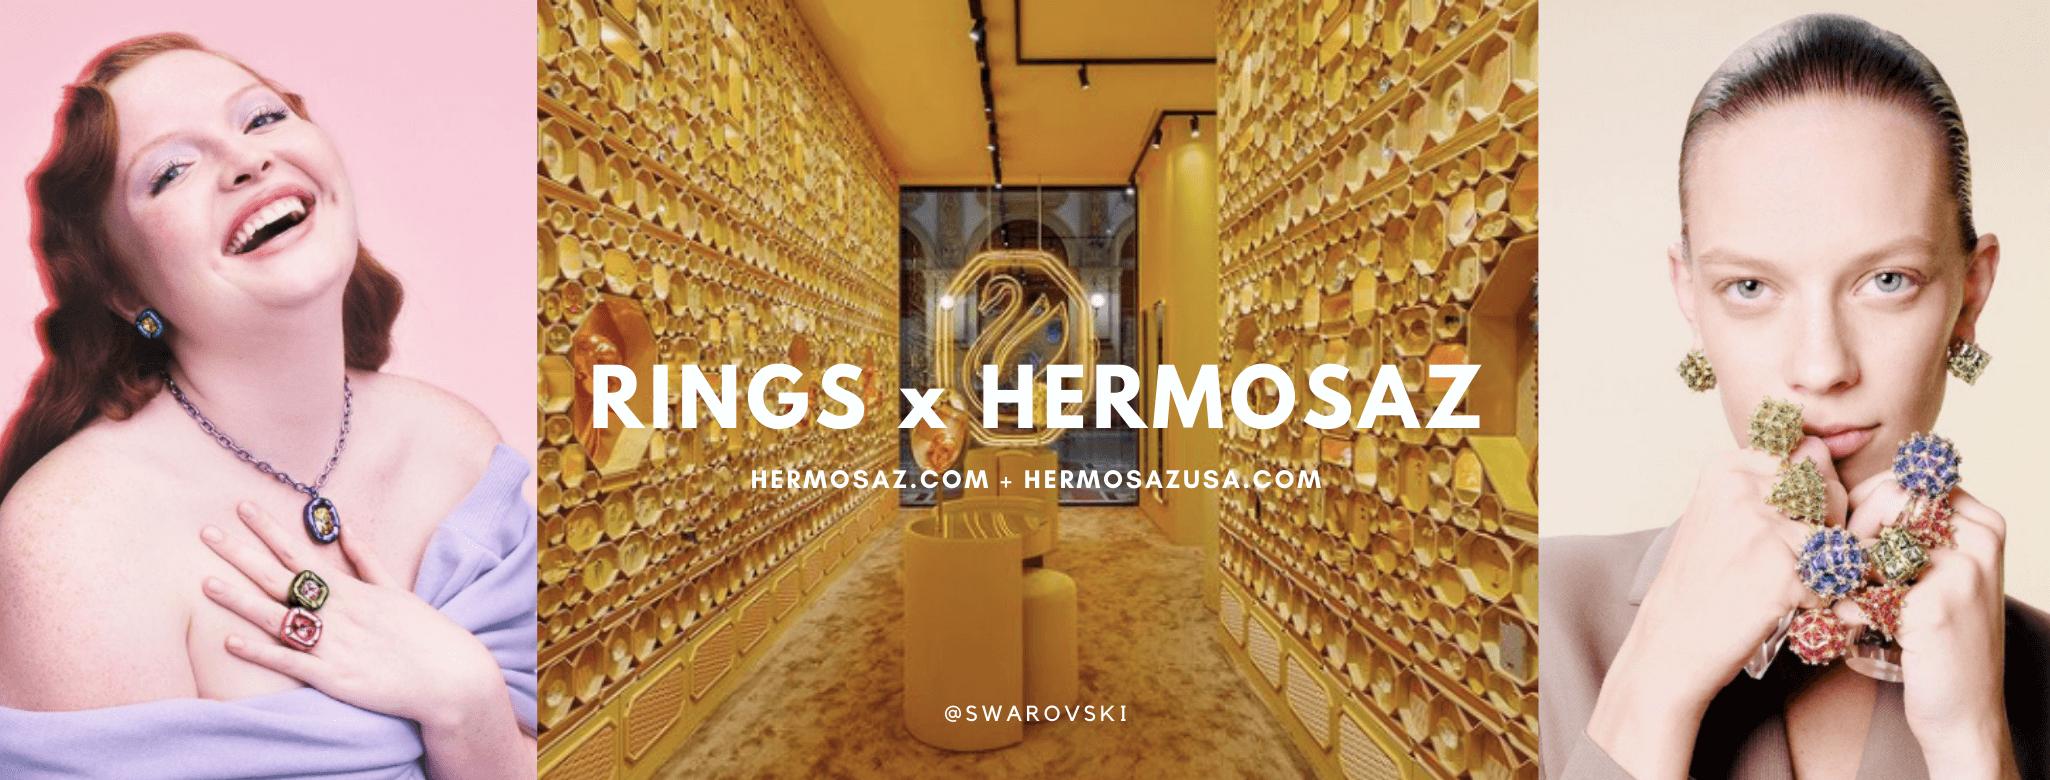 Rings x Hermosaz